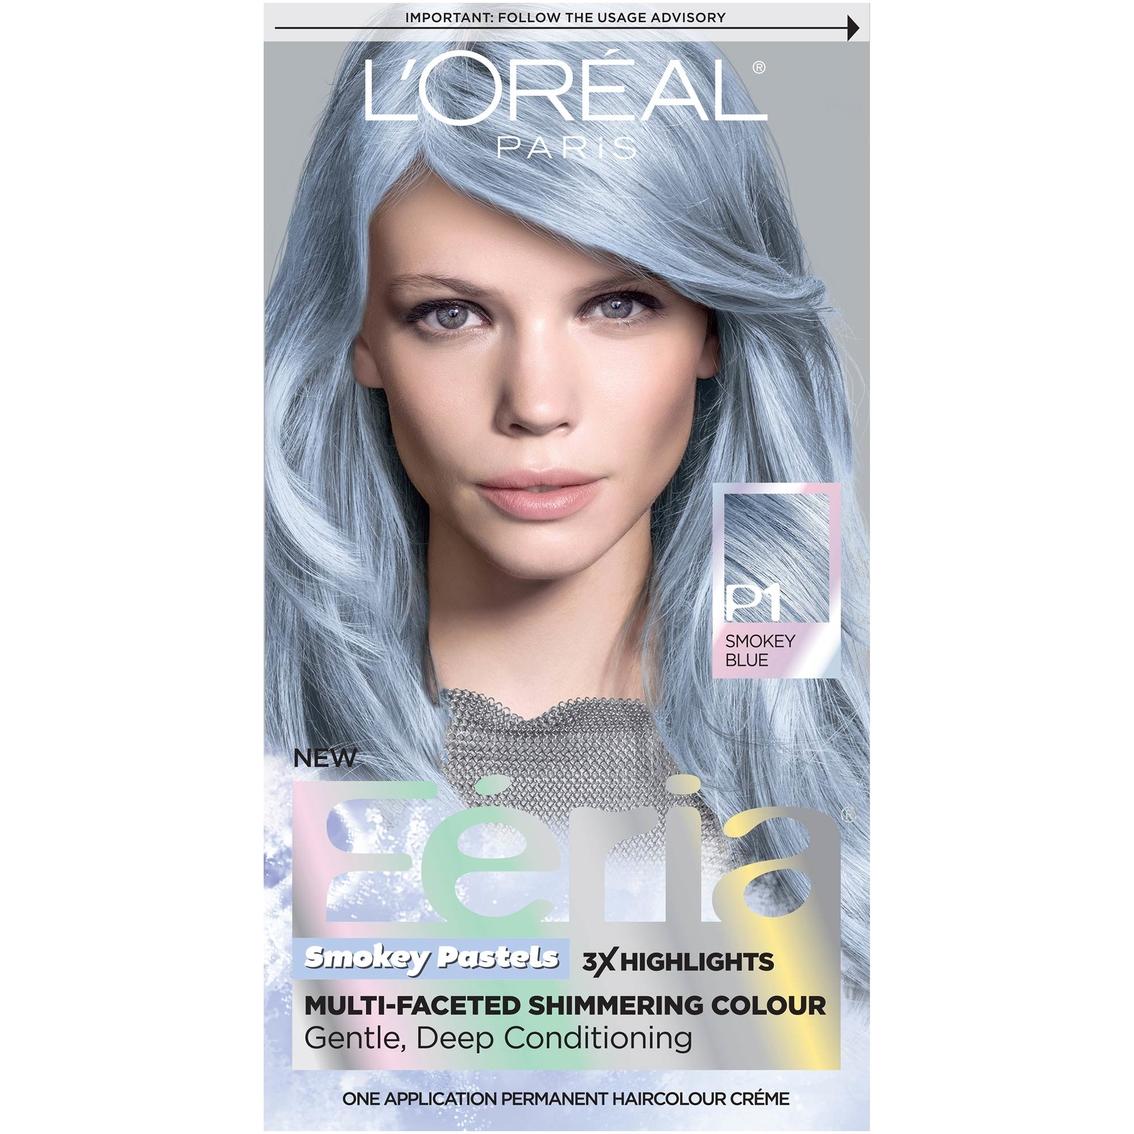 Loreal Feria Pastels Hair Color Hair Treatments Beauty Health